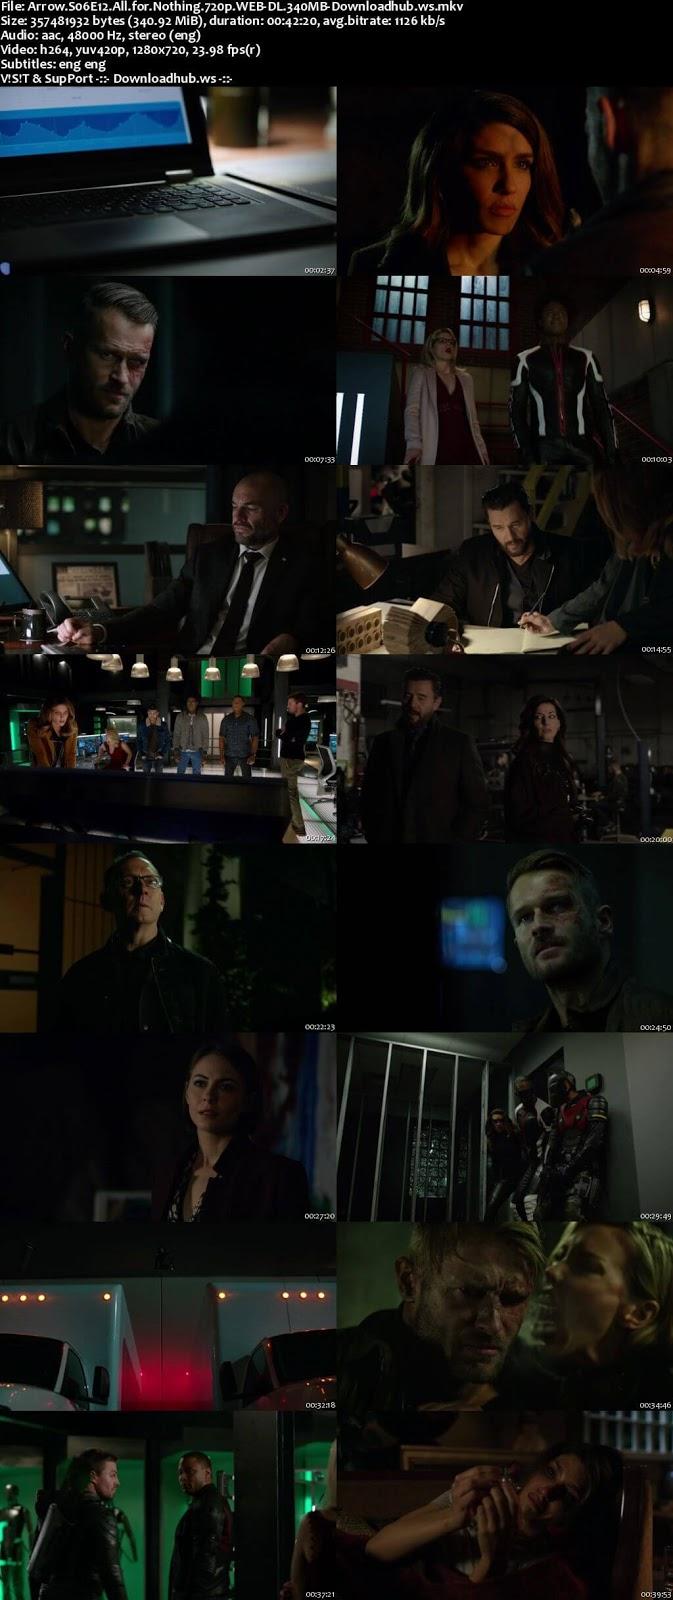 Arrow S06E13 340MB Web-DL 720p ESubs